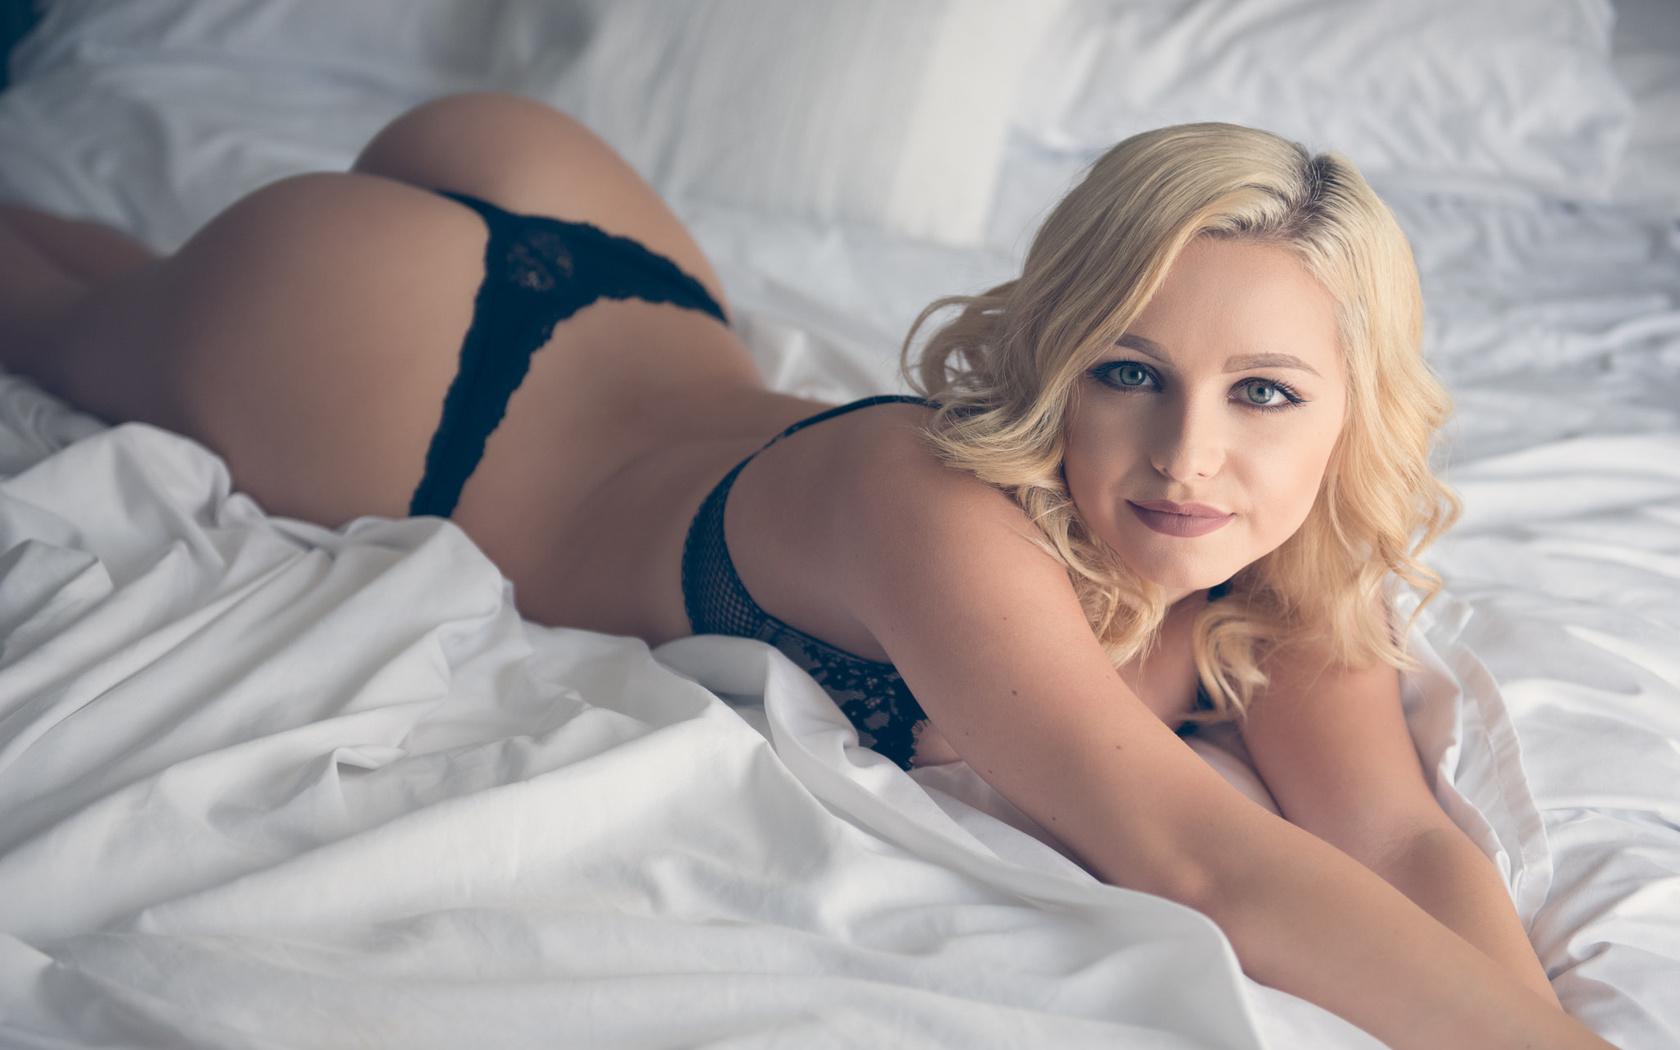 women, blonde, nude, in bed, smiling, ass, brunette, lying on front, black lingerie, девушка, блондинка, взгляд, макияж, фигурка, нижнее белье, попка